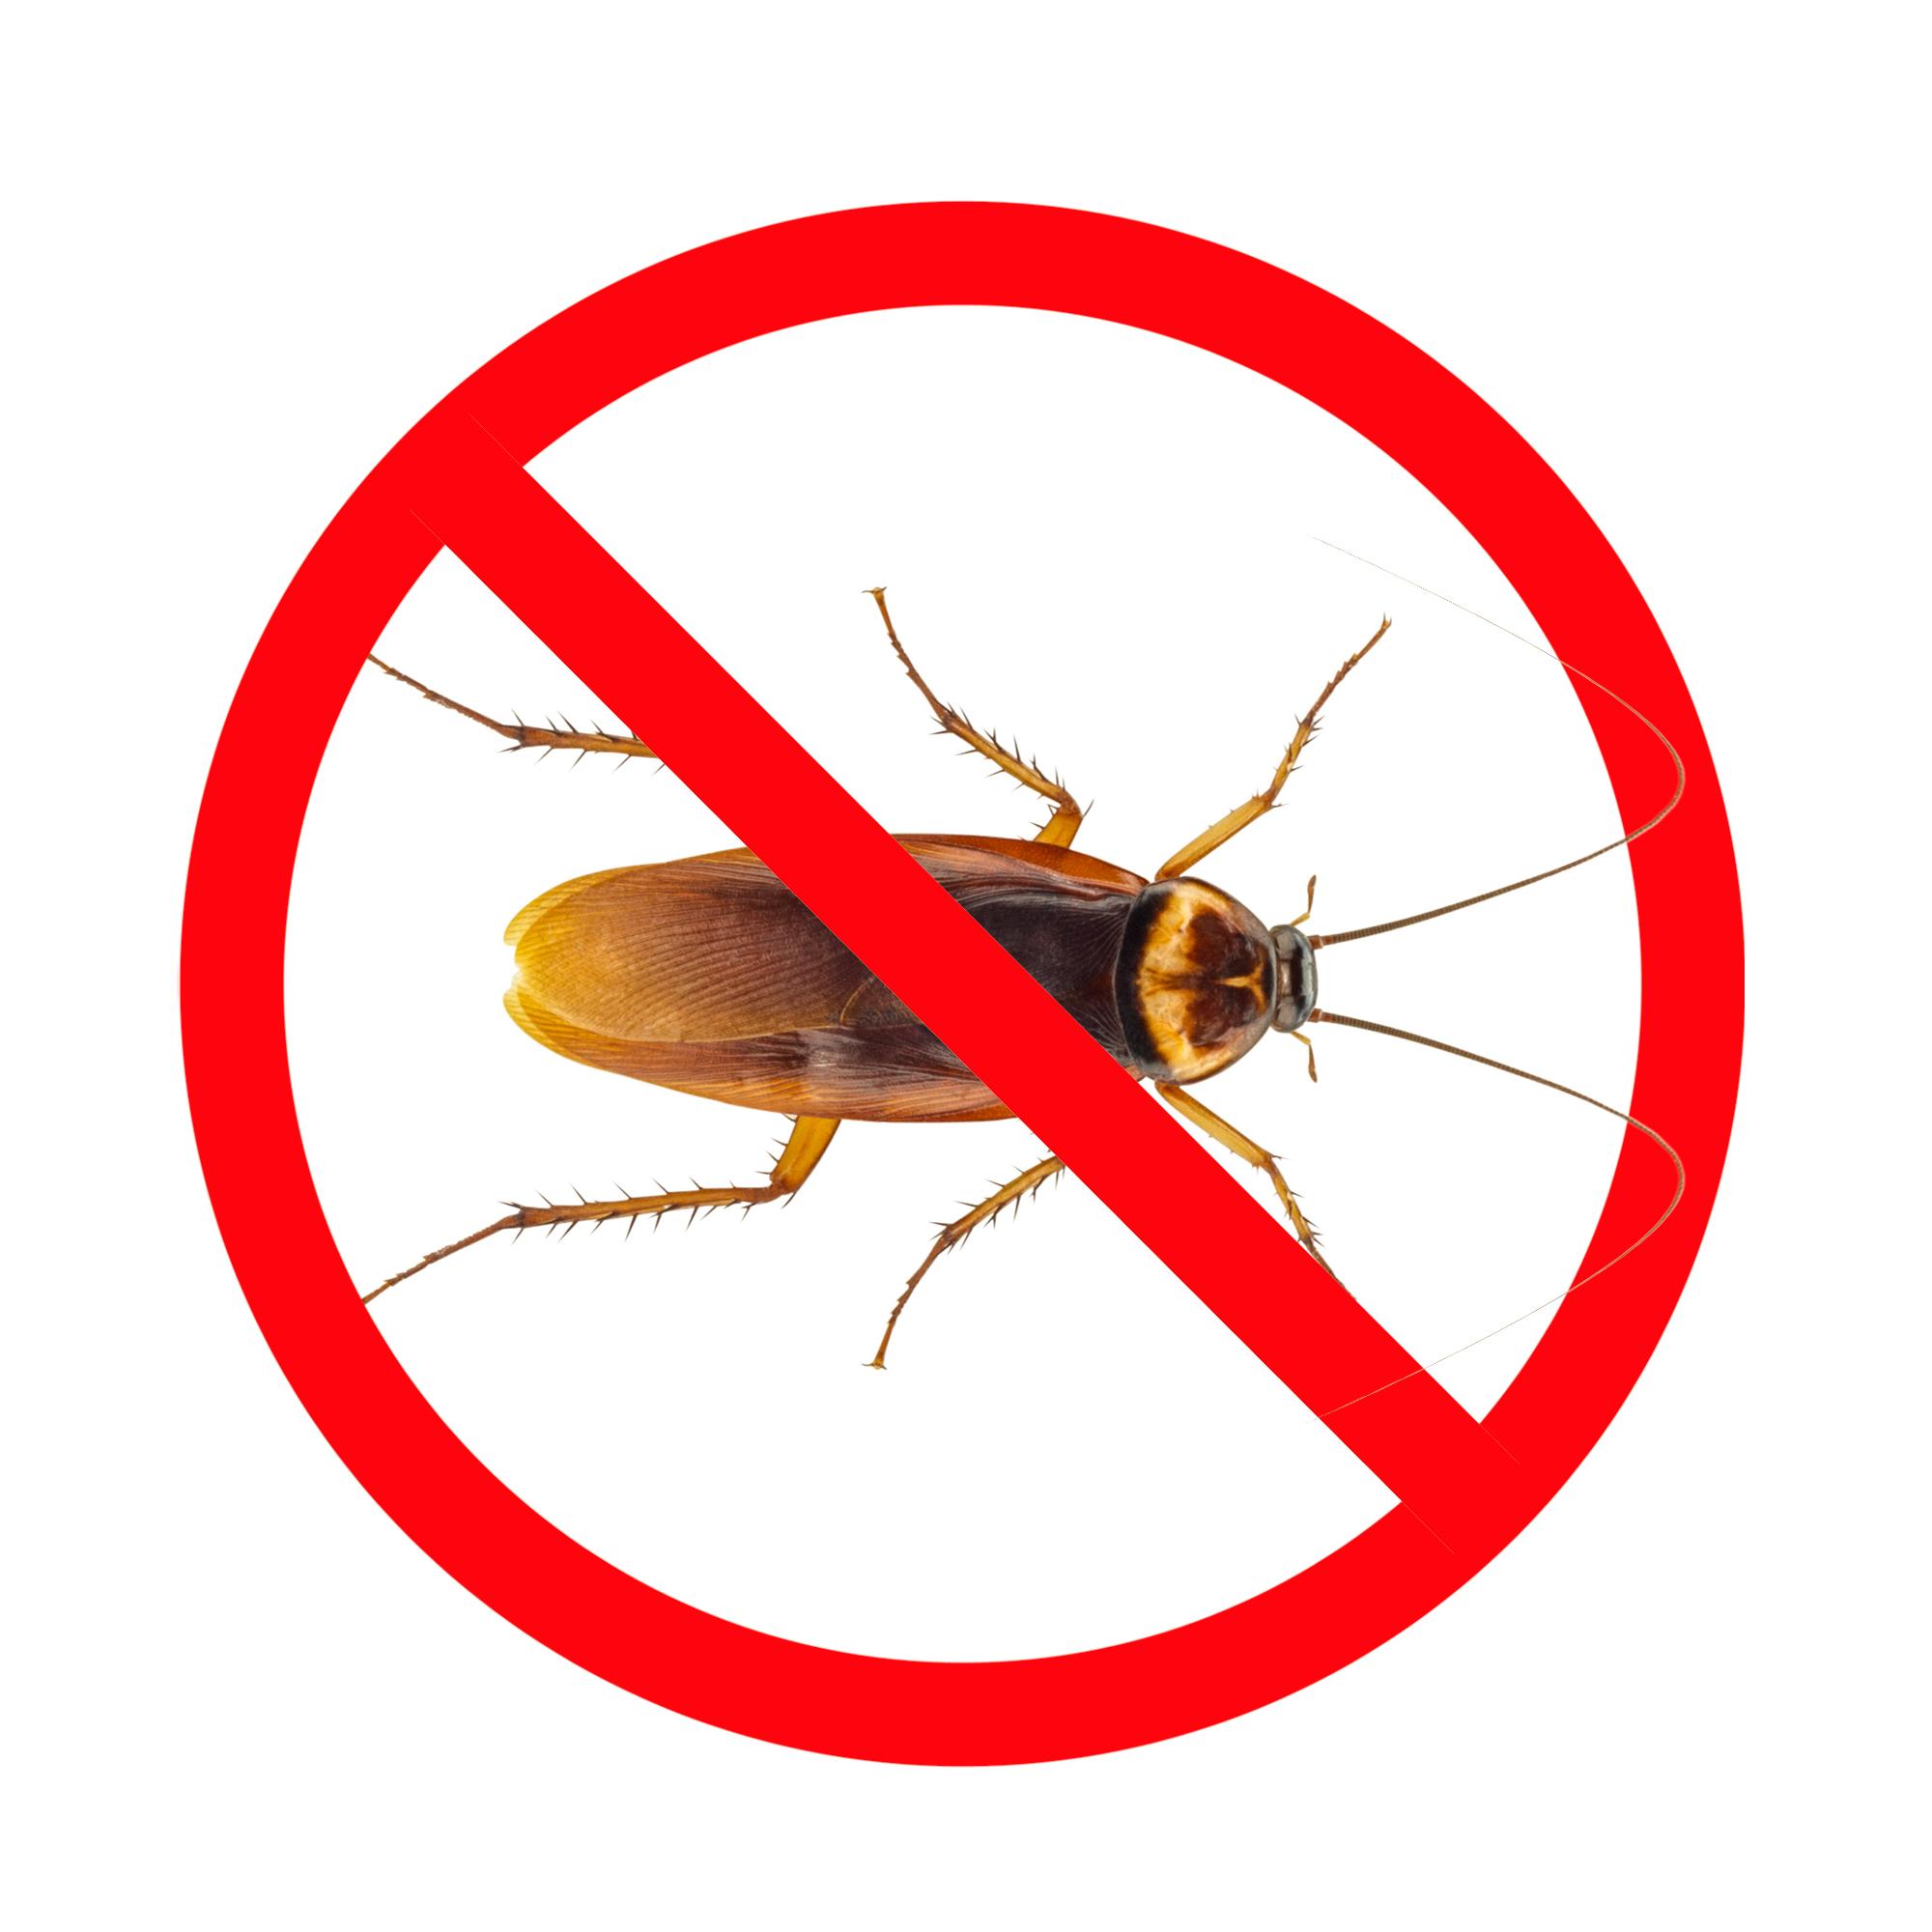 Pest Control Roaches